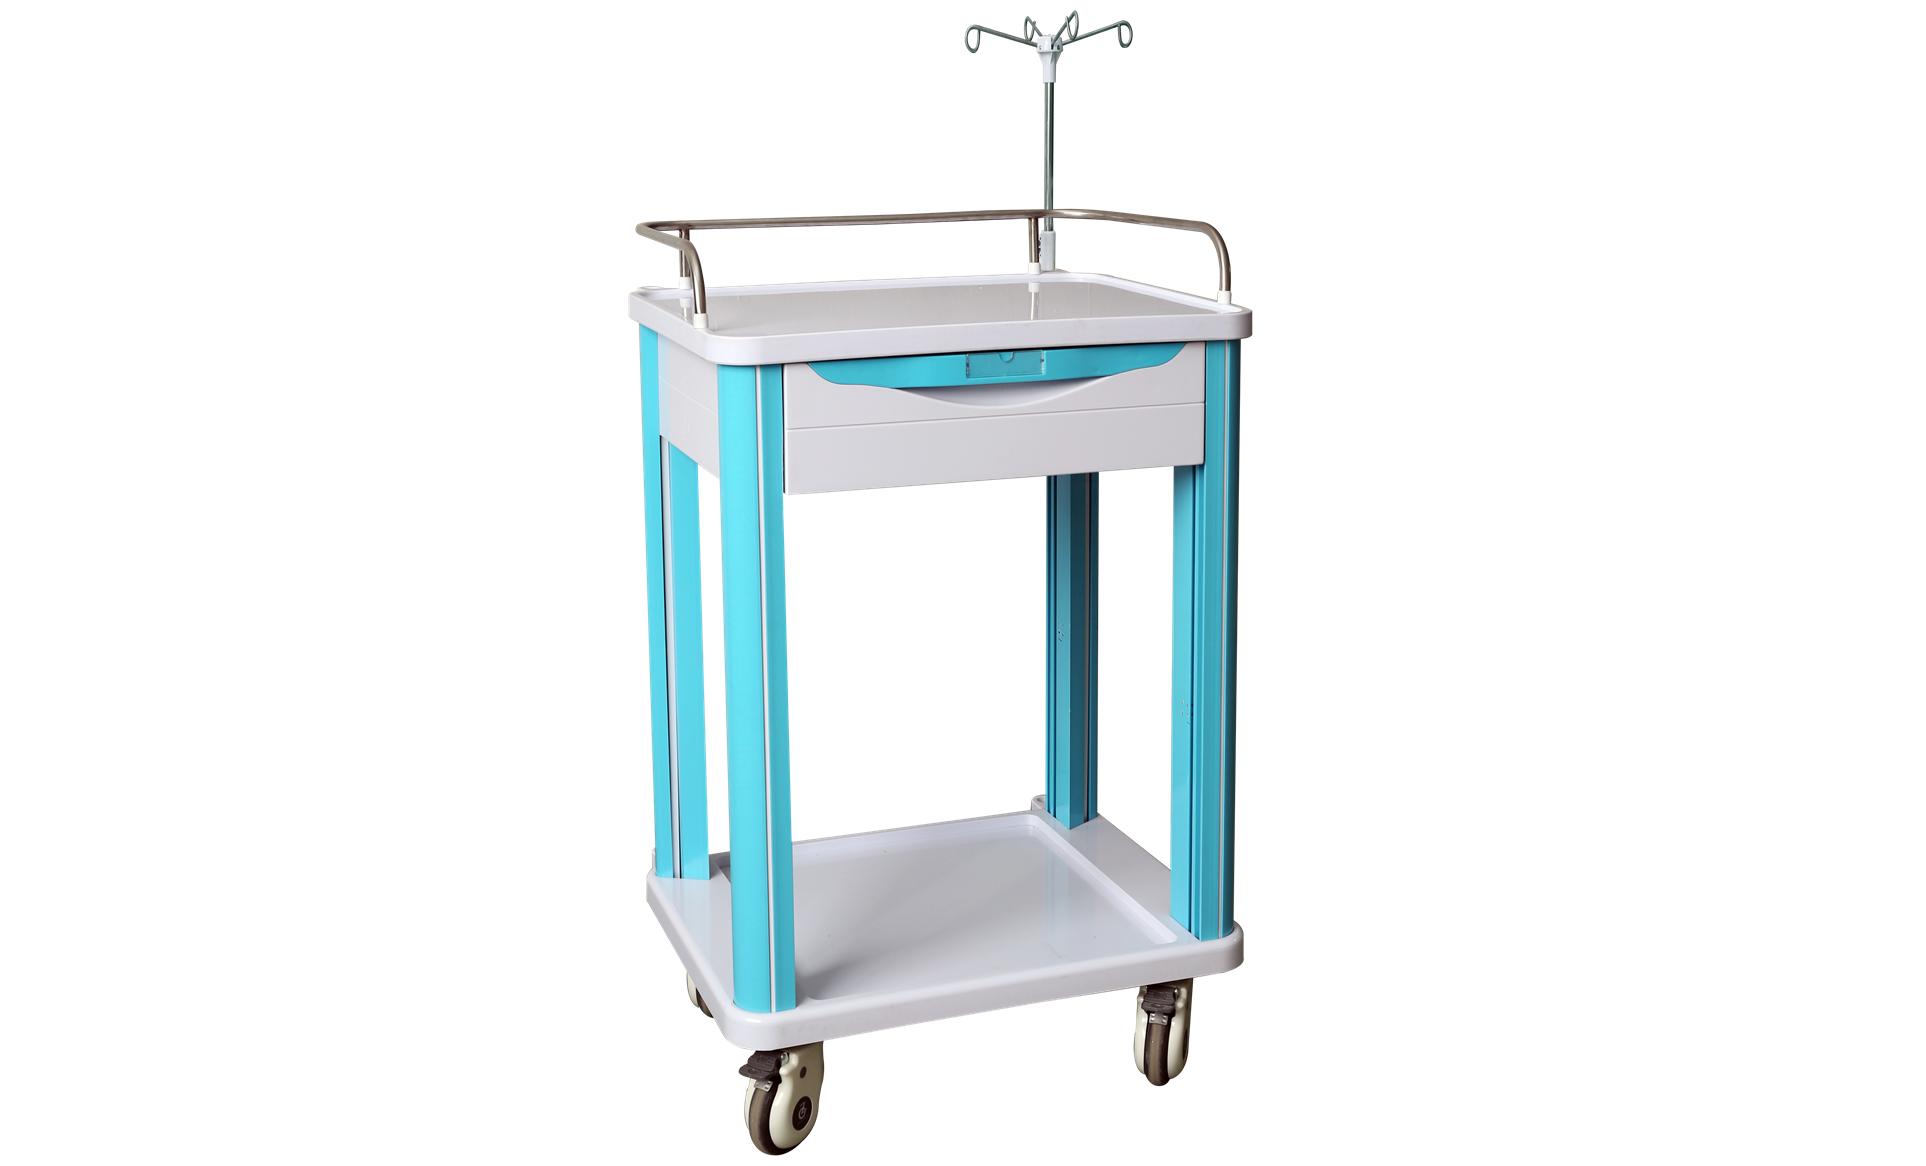 DW-TT002 ABS Treatment trolley